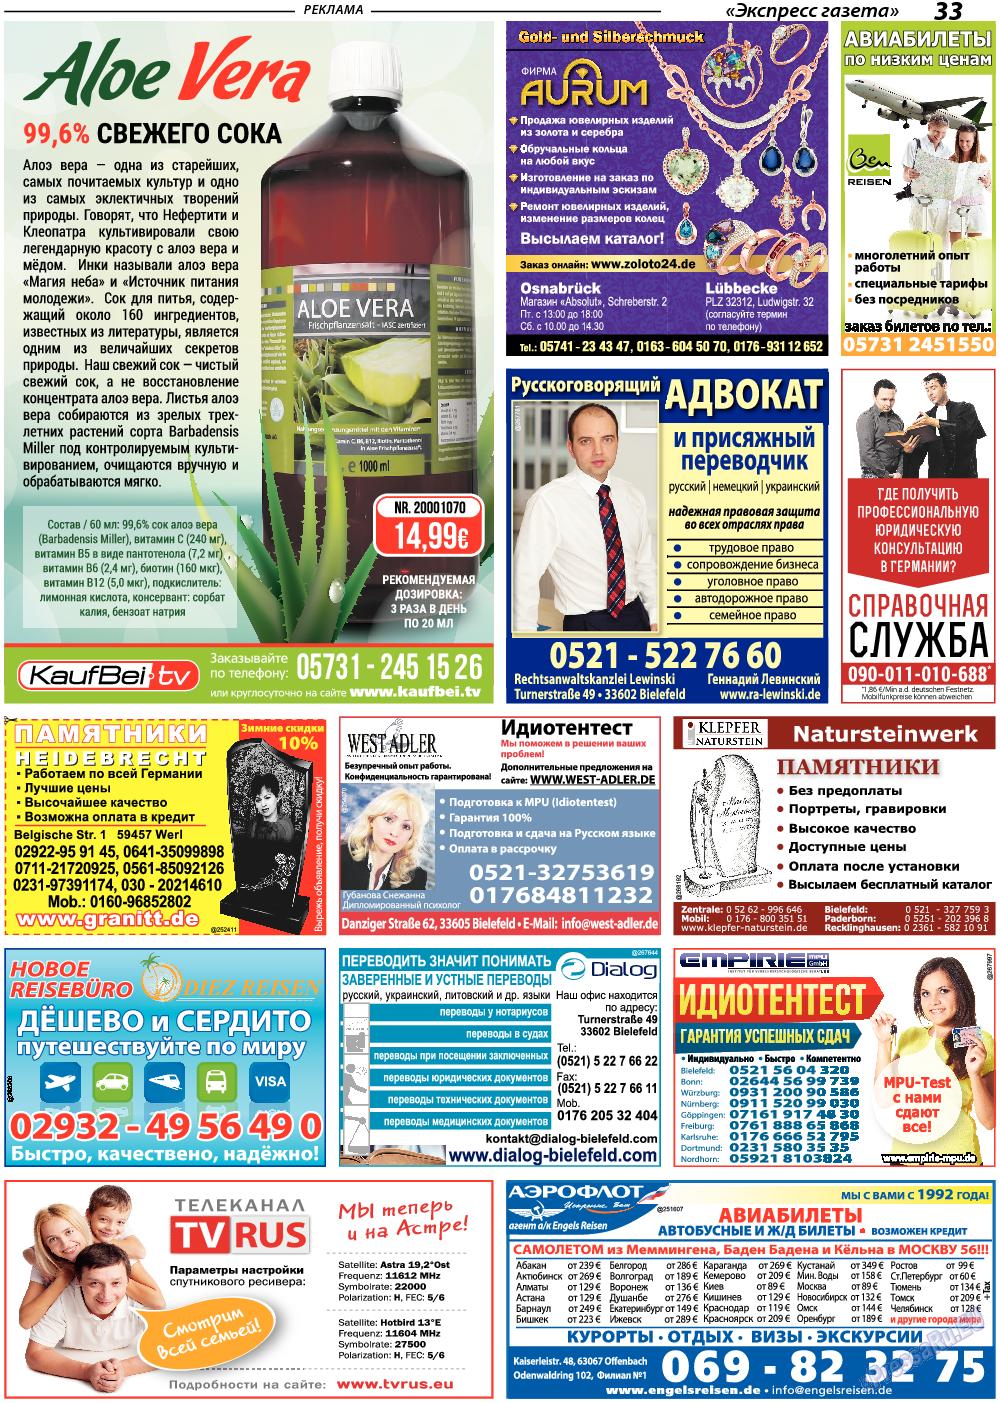 Экспресс газета (газета). 2018 год, номер 2, стр. 33